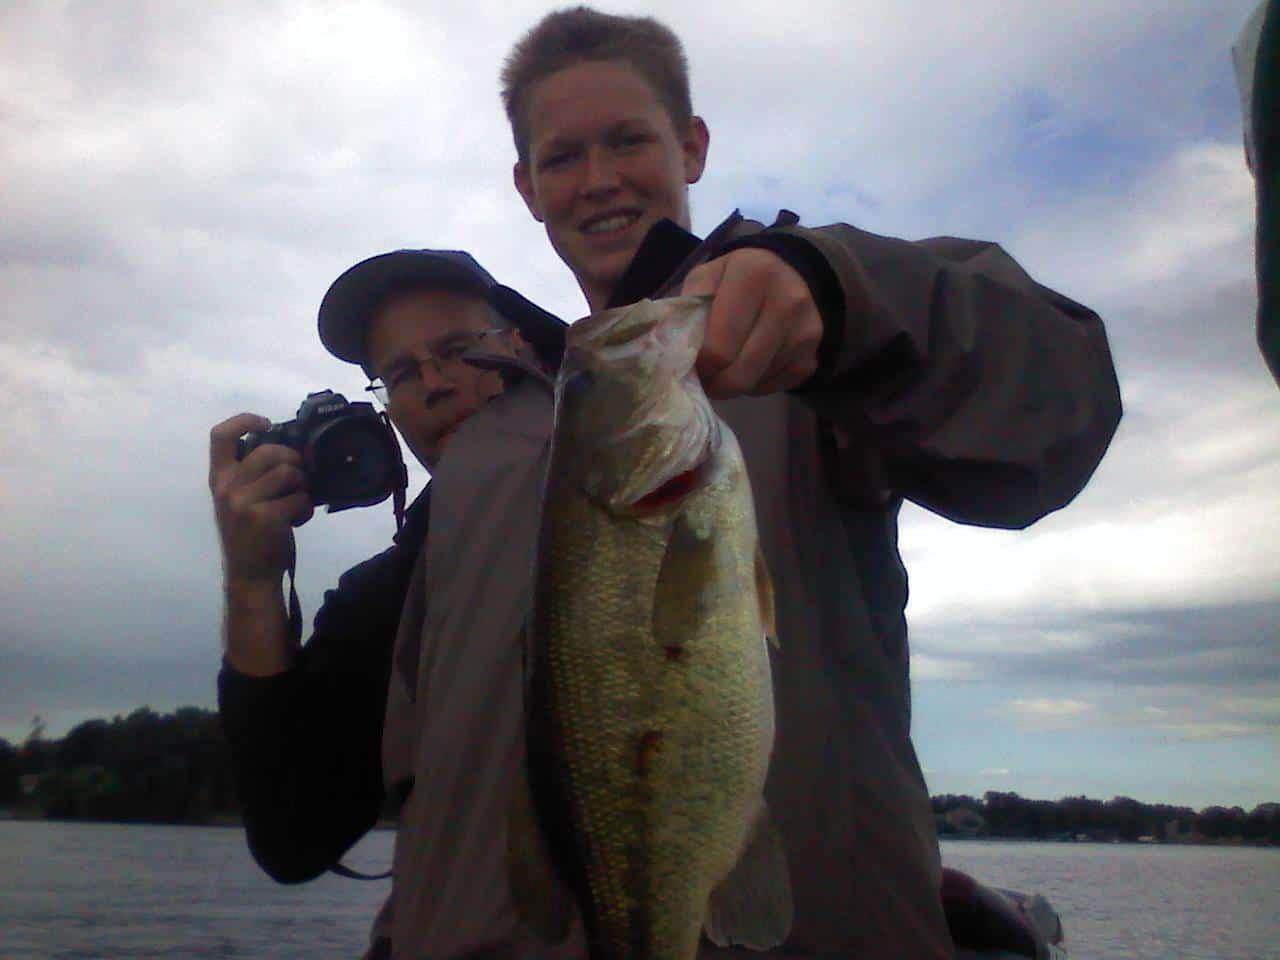 Lake Minnetonka Fishing Guide 81311